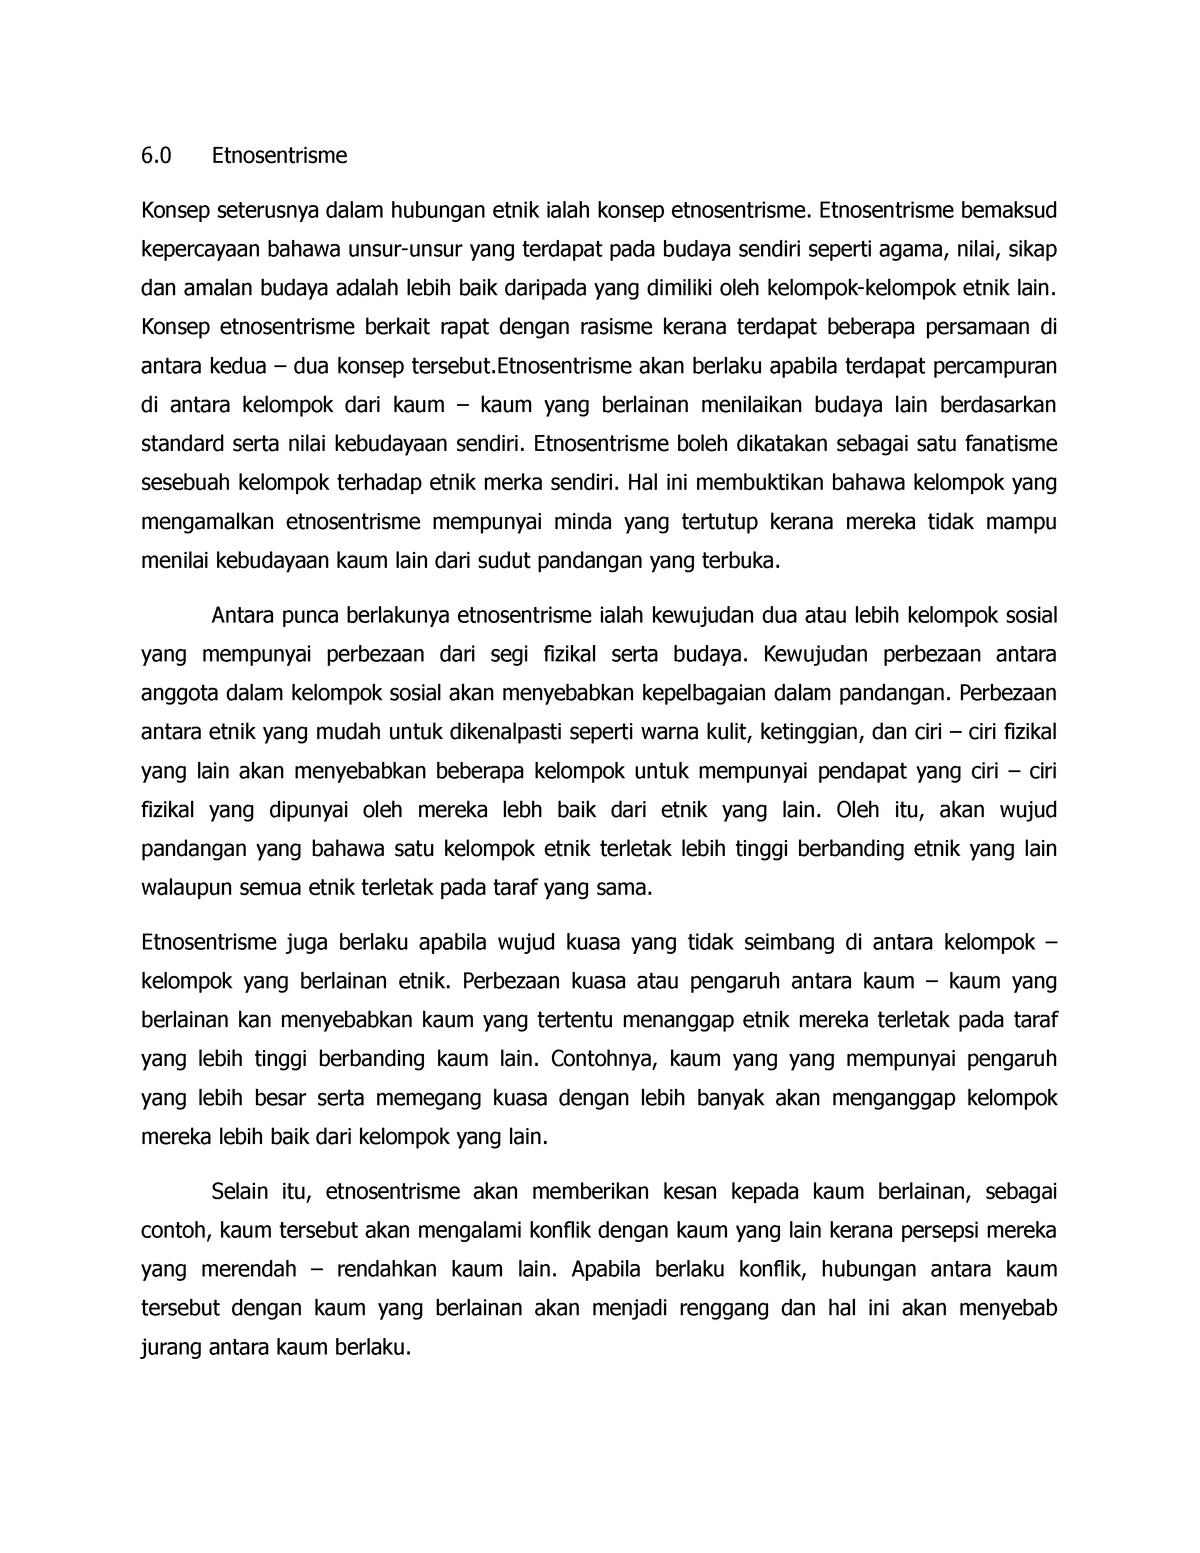 Konsep Etnosentrik Hubungan Etnik Uw00102 Ums Studocu